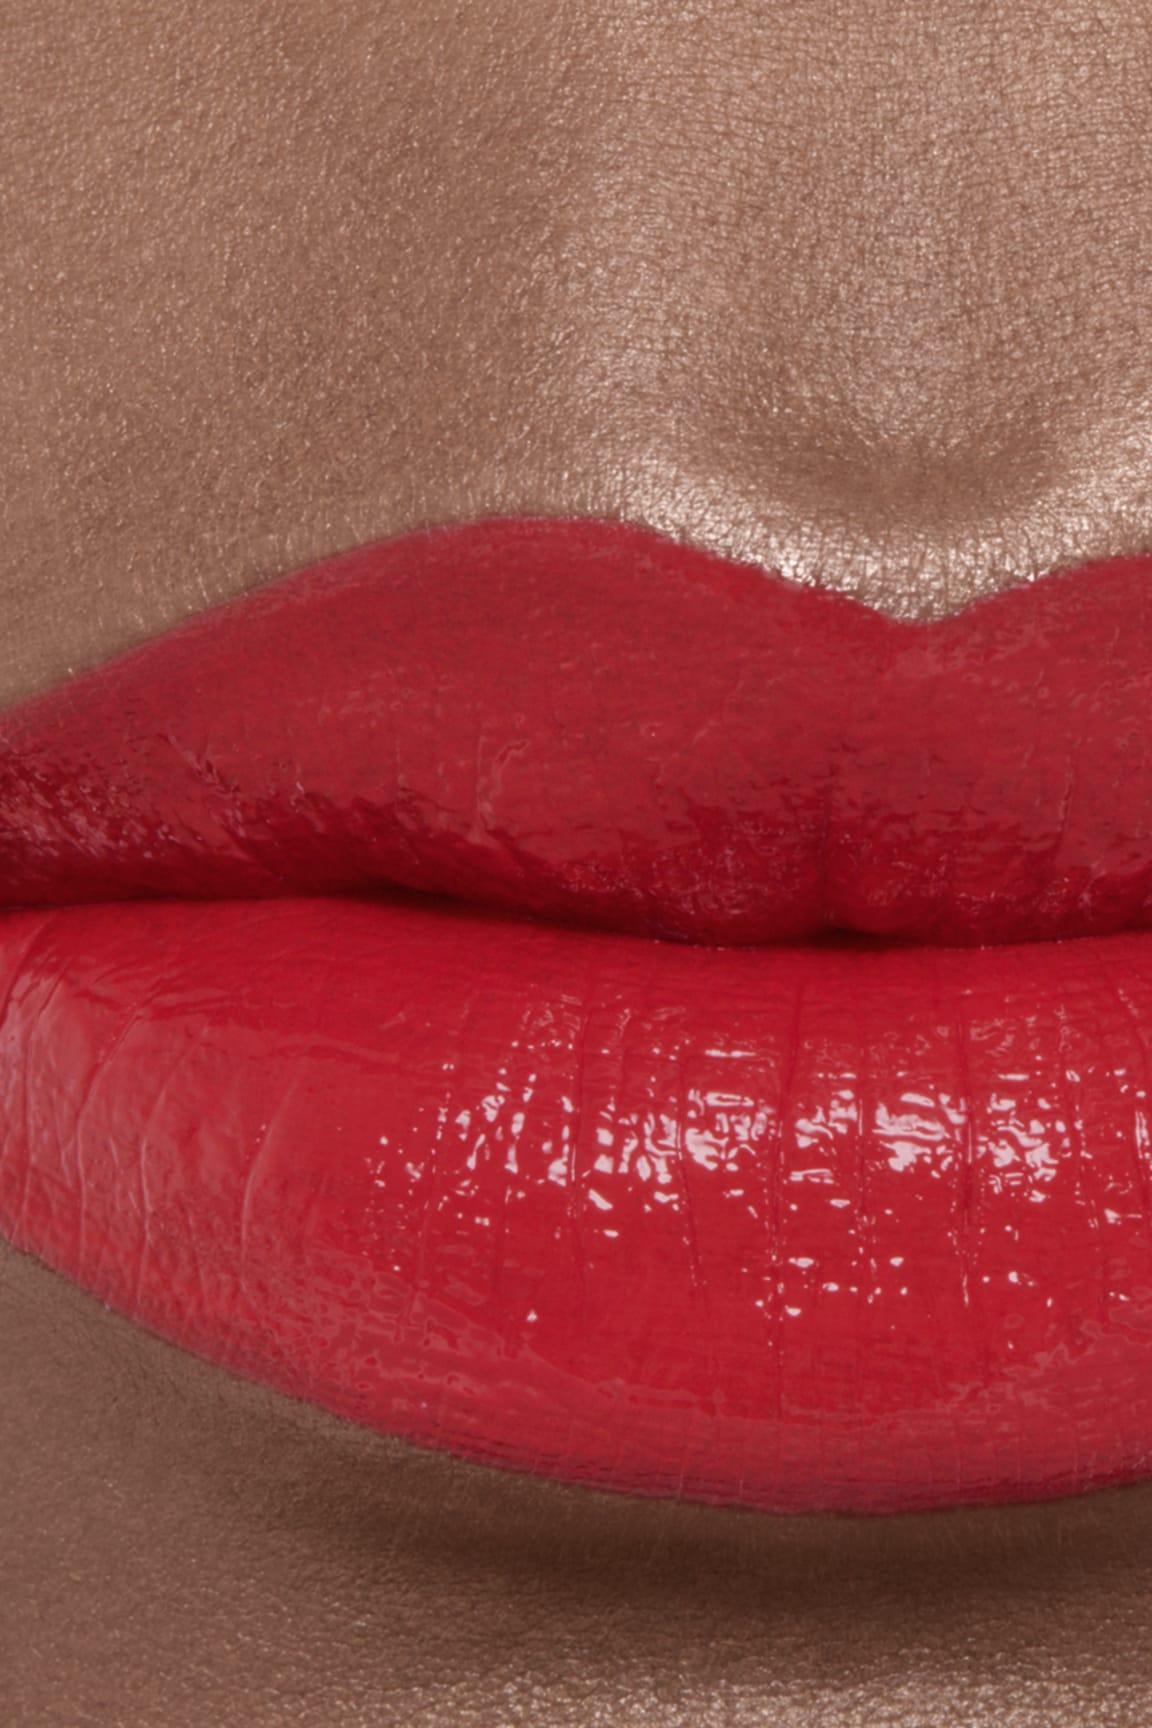 Anwendung Make-up-Bild 2 - ROUGE COCO BLOOM 130 - BLOSSOM